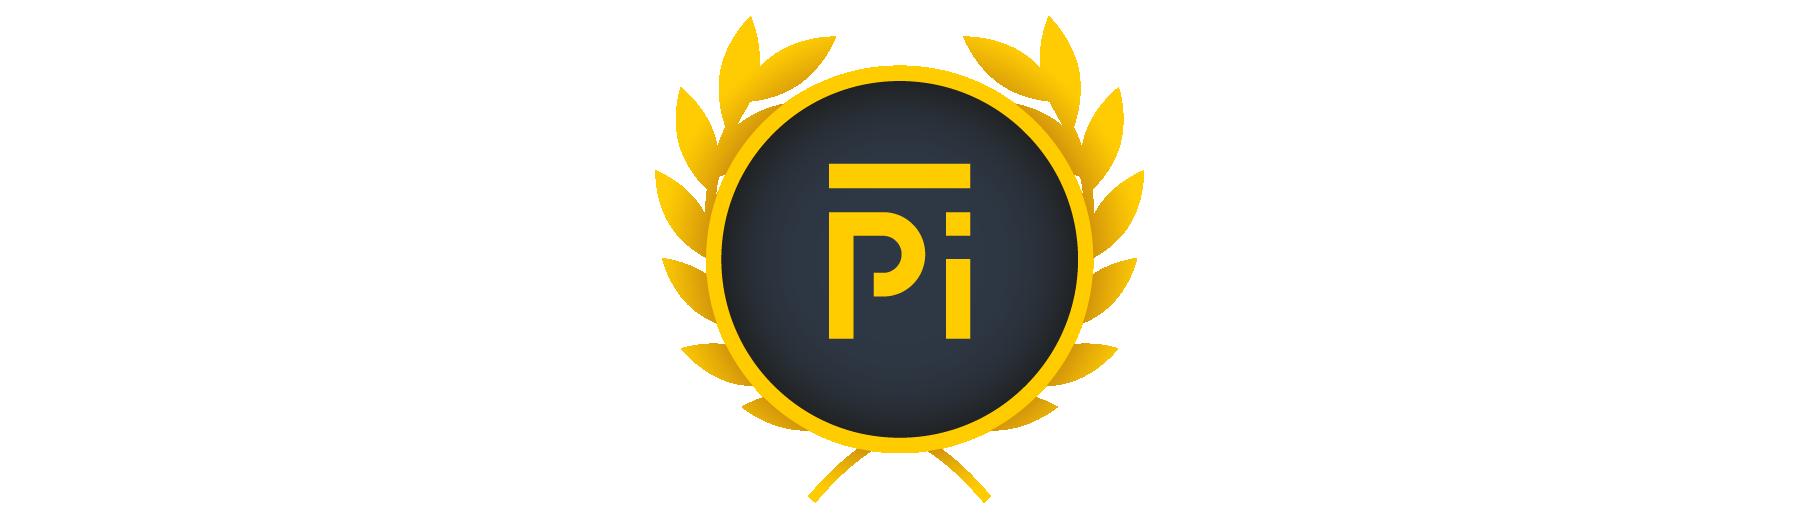 Logo de la certification programme pi